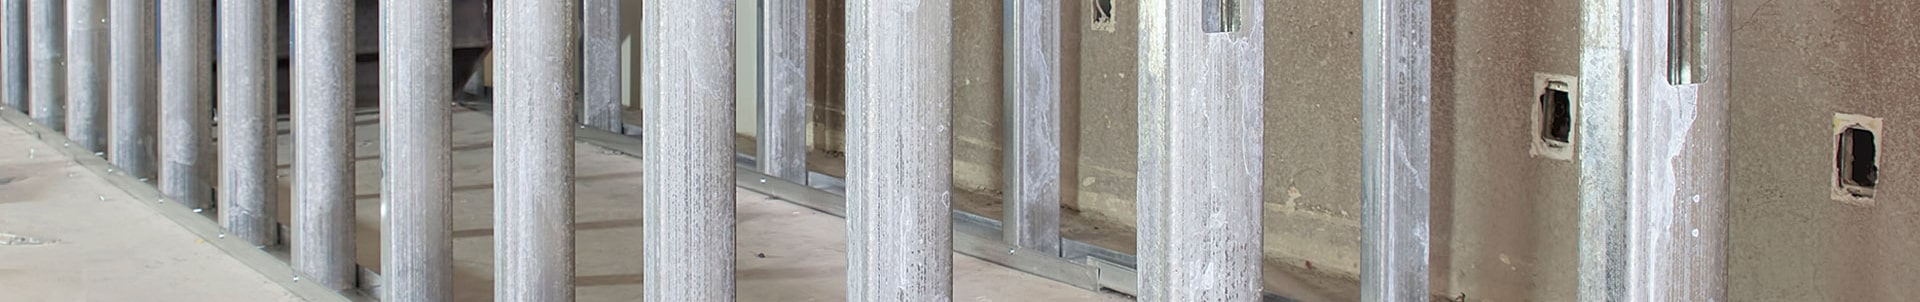 sub-banner-interior-framing